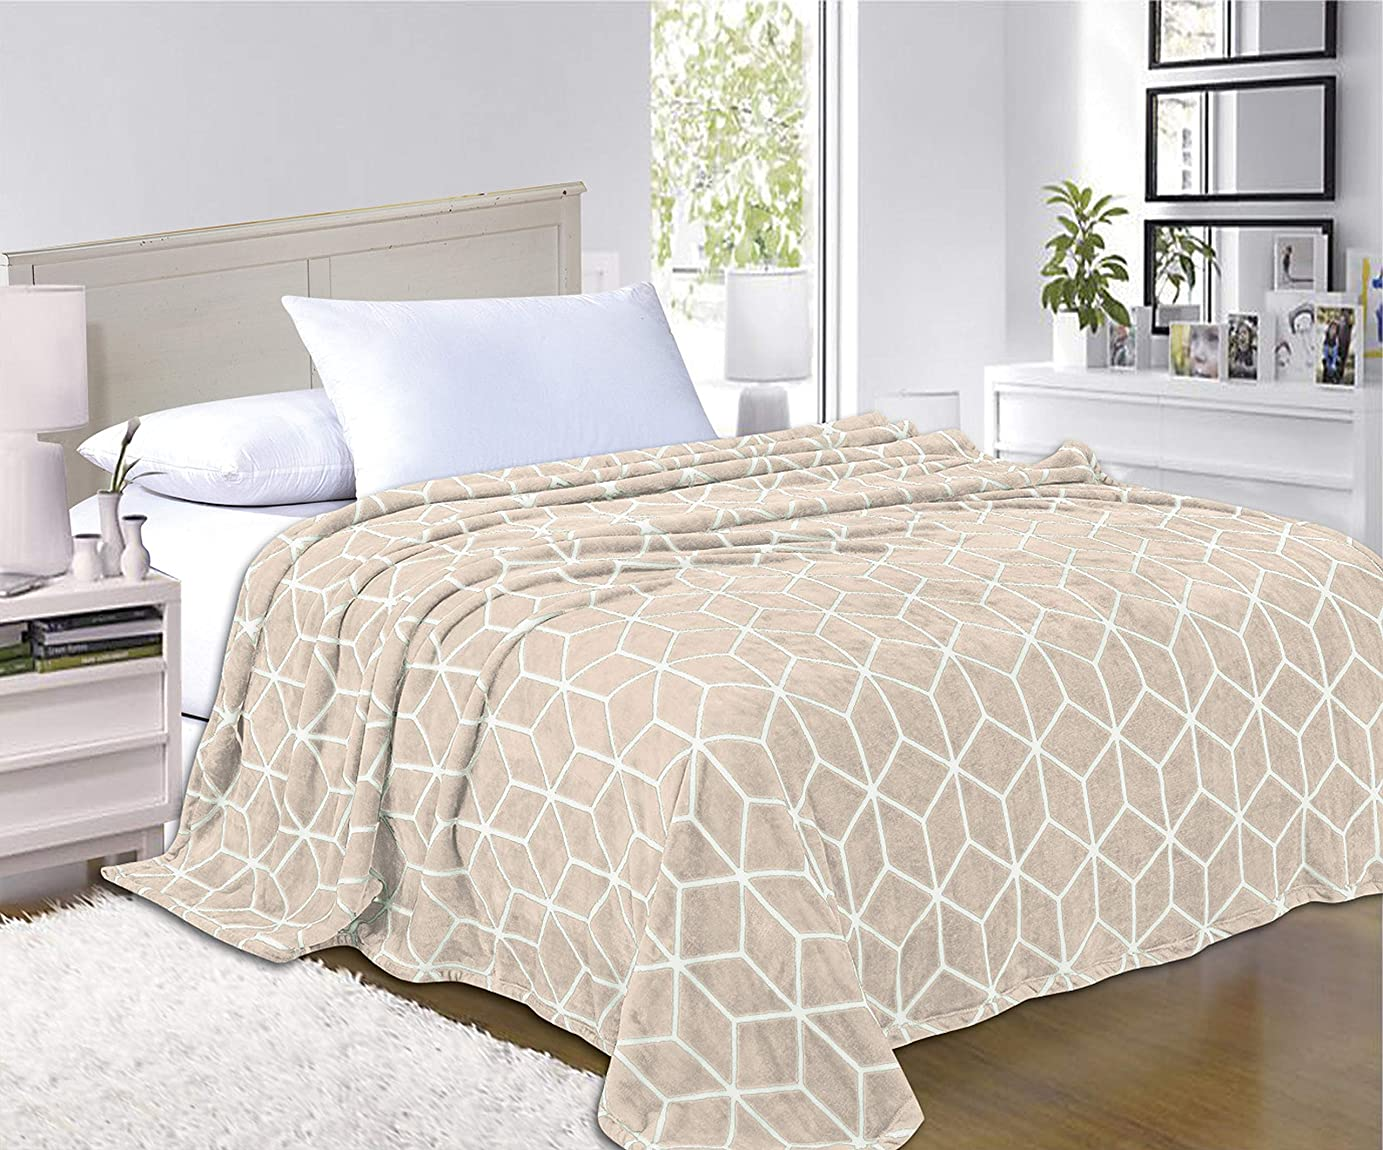 (King/California King, Cream) - Elegant Comfort 1 Fleece Blanket on Amazon - Luxury Micro-Fleece Ultra Plush Cube Pattern - All Season Blanket, King/California King, Cream